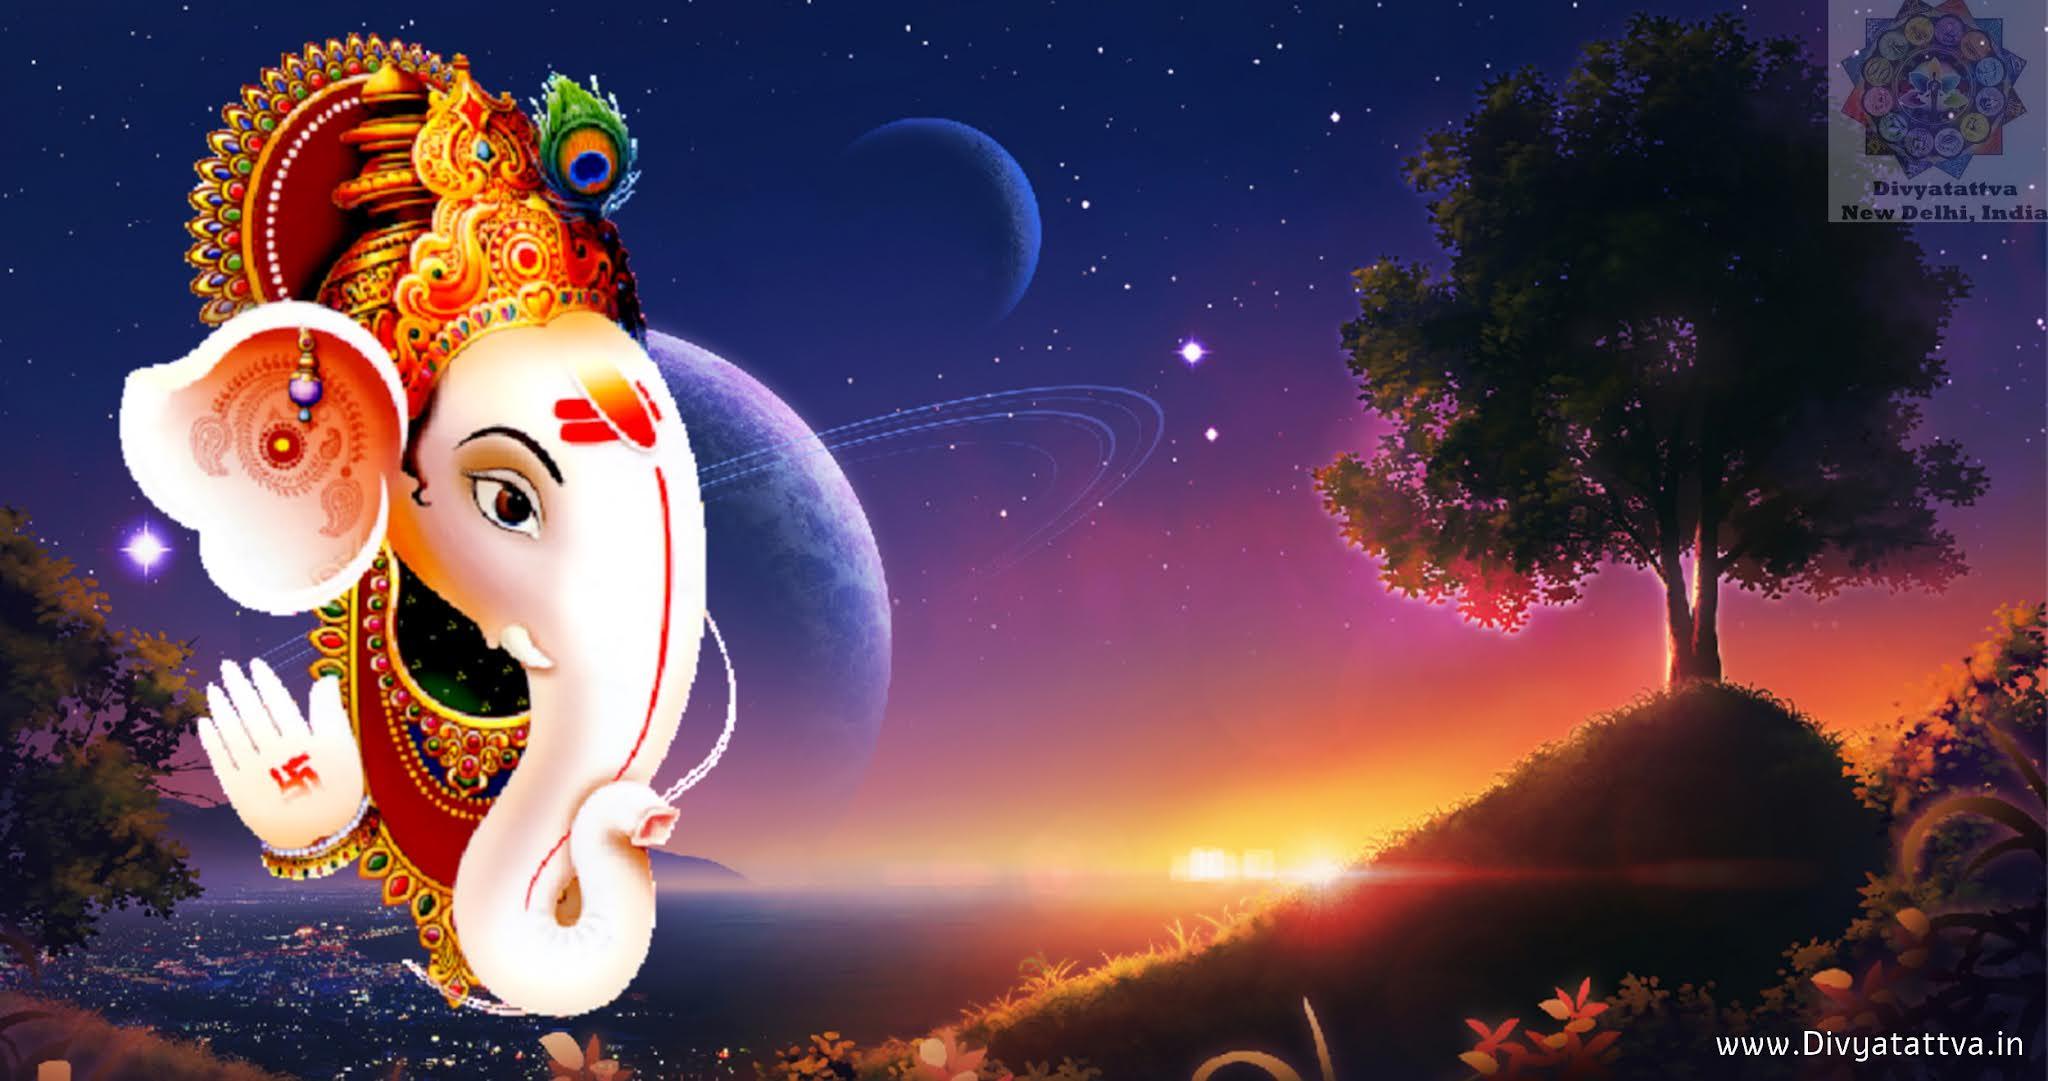 Hindu Festival Ganesh, Chaturthi 3D Backgrounds, Siddhi Vinayak Wallpapers Sri Ganesh Background Images and Stock Photos